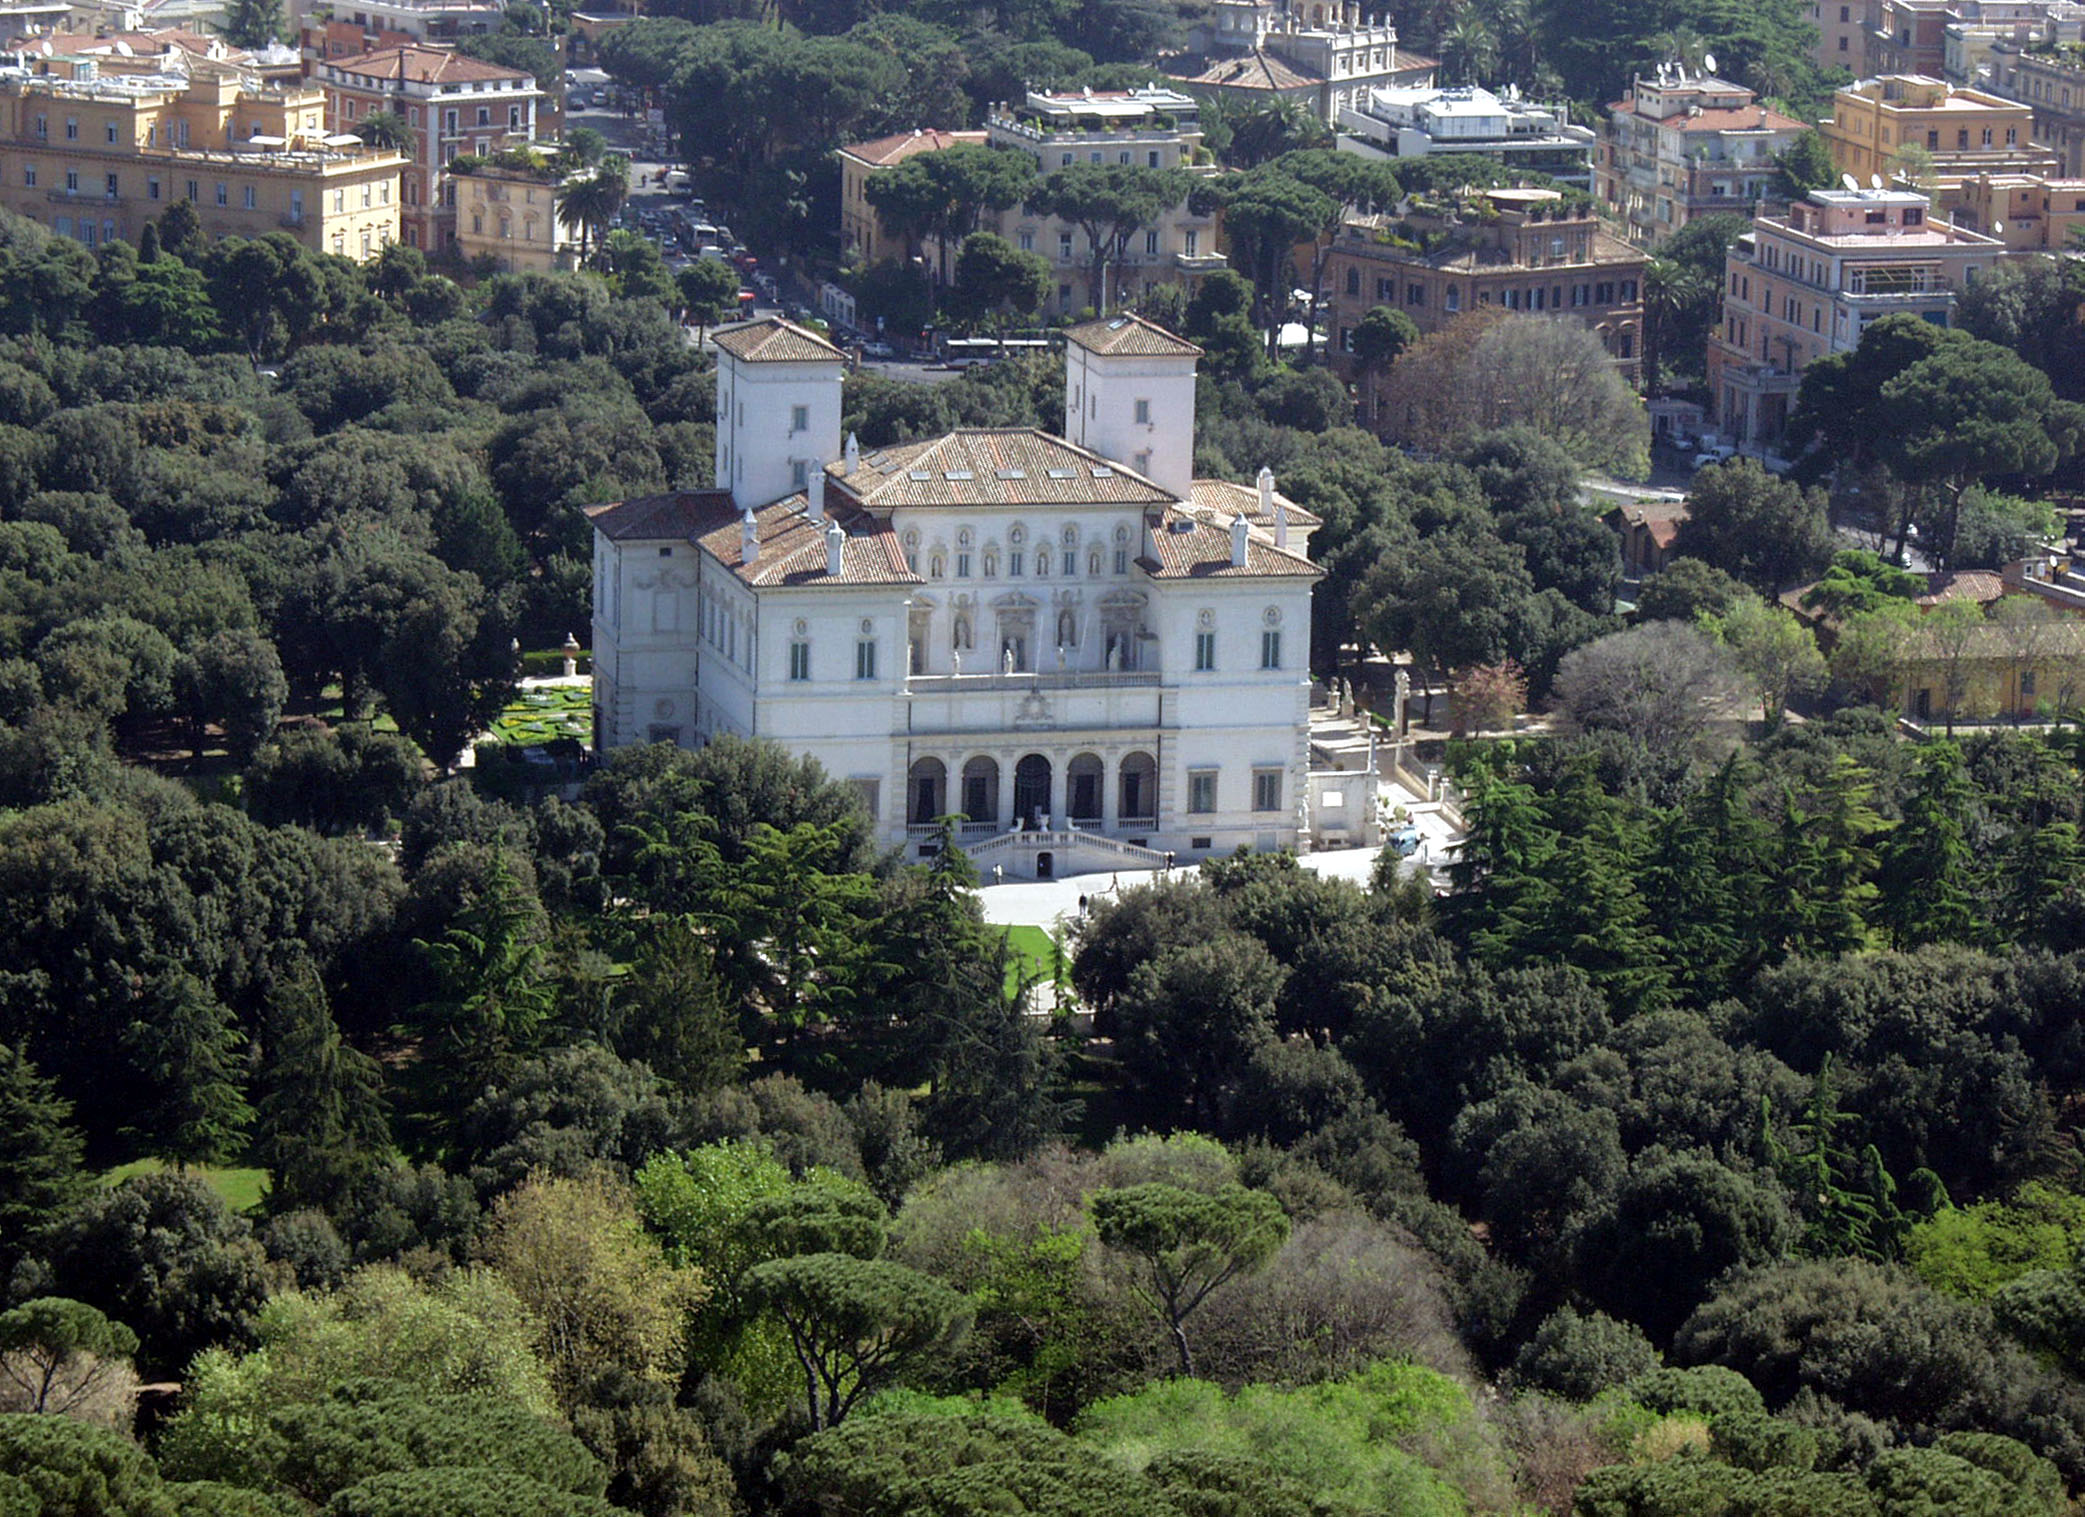 Villa Medici Hotel Florence